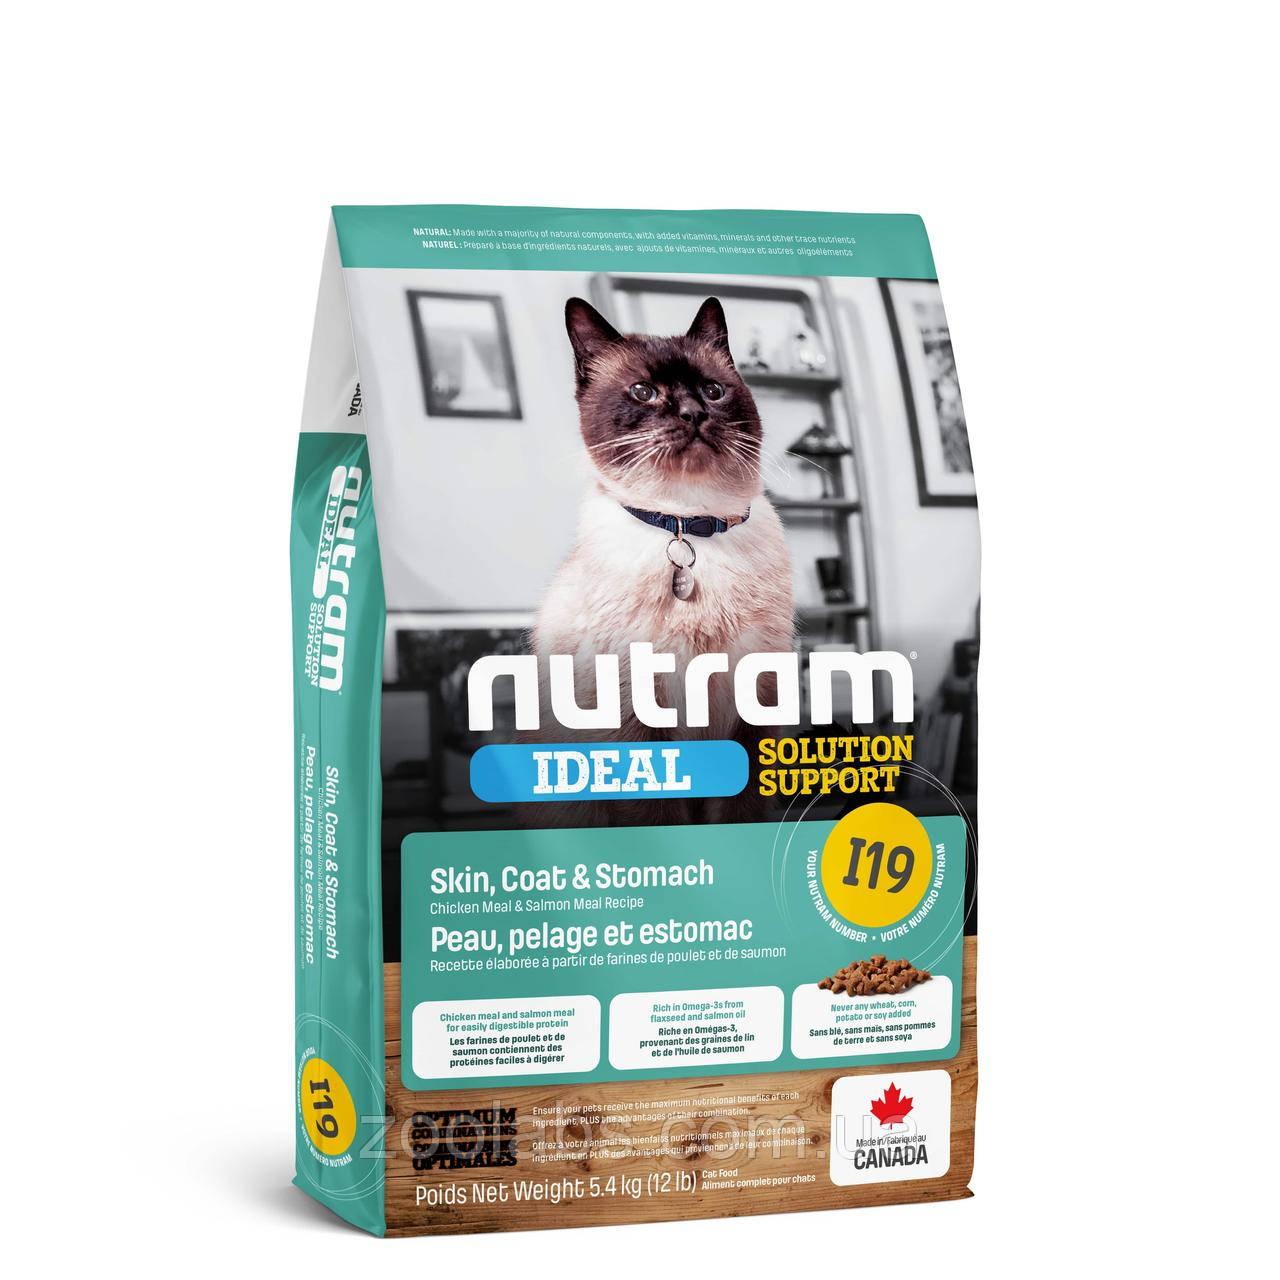 Корм Nutram для кошек   Nutram I19 Ideal Solution Support Sensetive Coat, Skin, Stomach Cat Food 5,4 кг